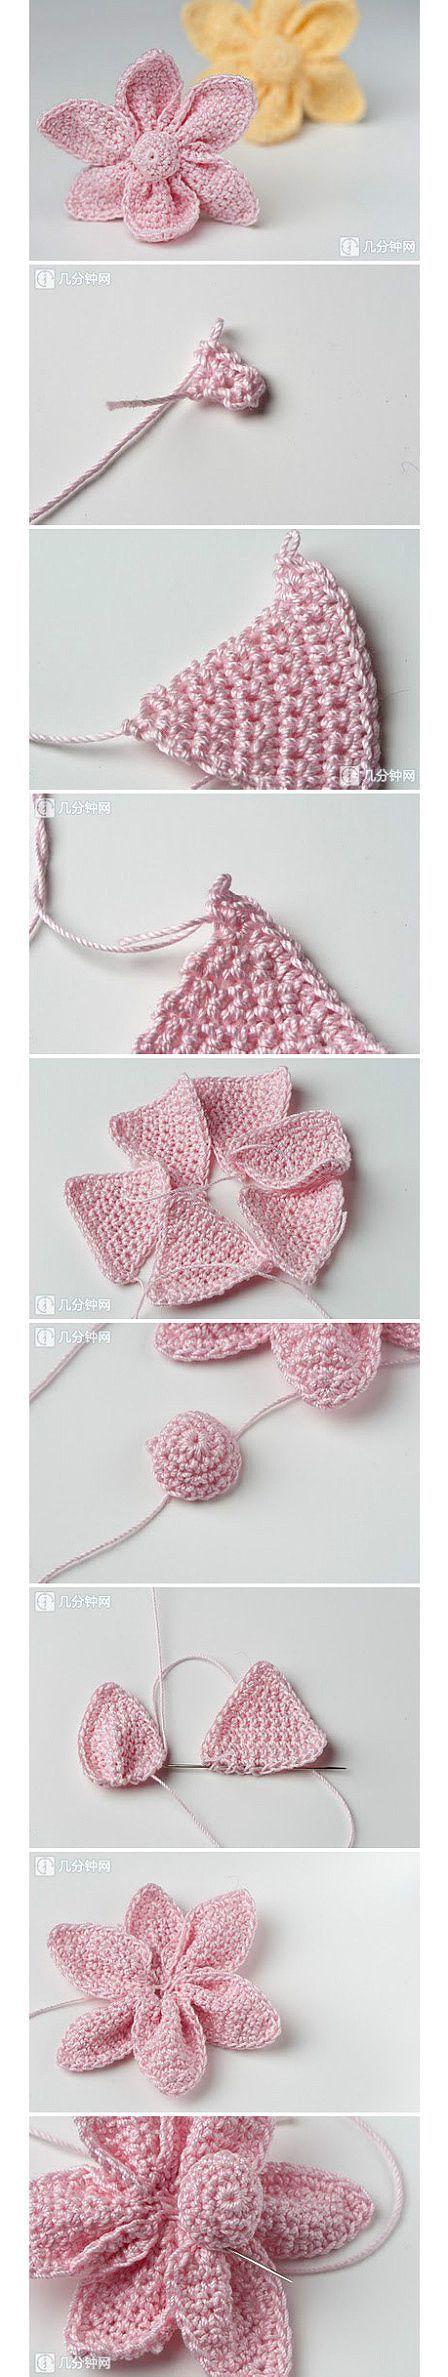 DIY Crochet Flower !  See more : https://www.youtube.com/channel/UC2iZiJnsFuIU7L5-8-ULlvA